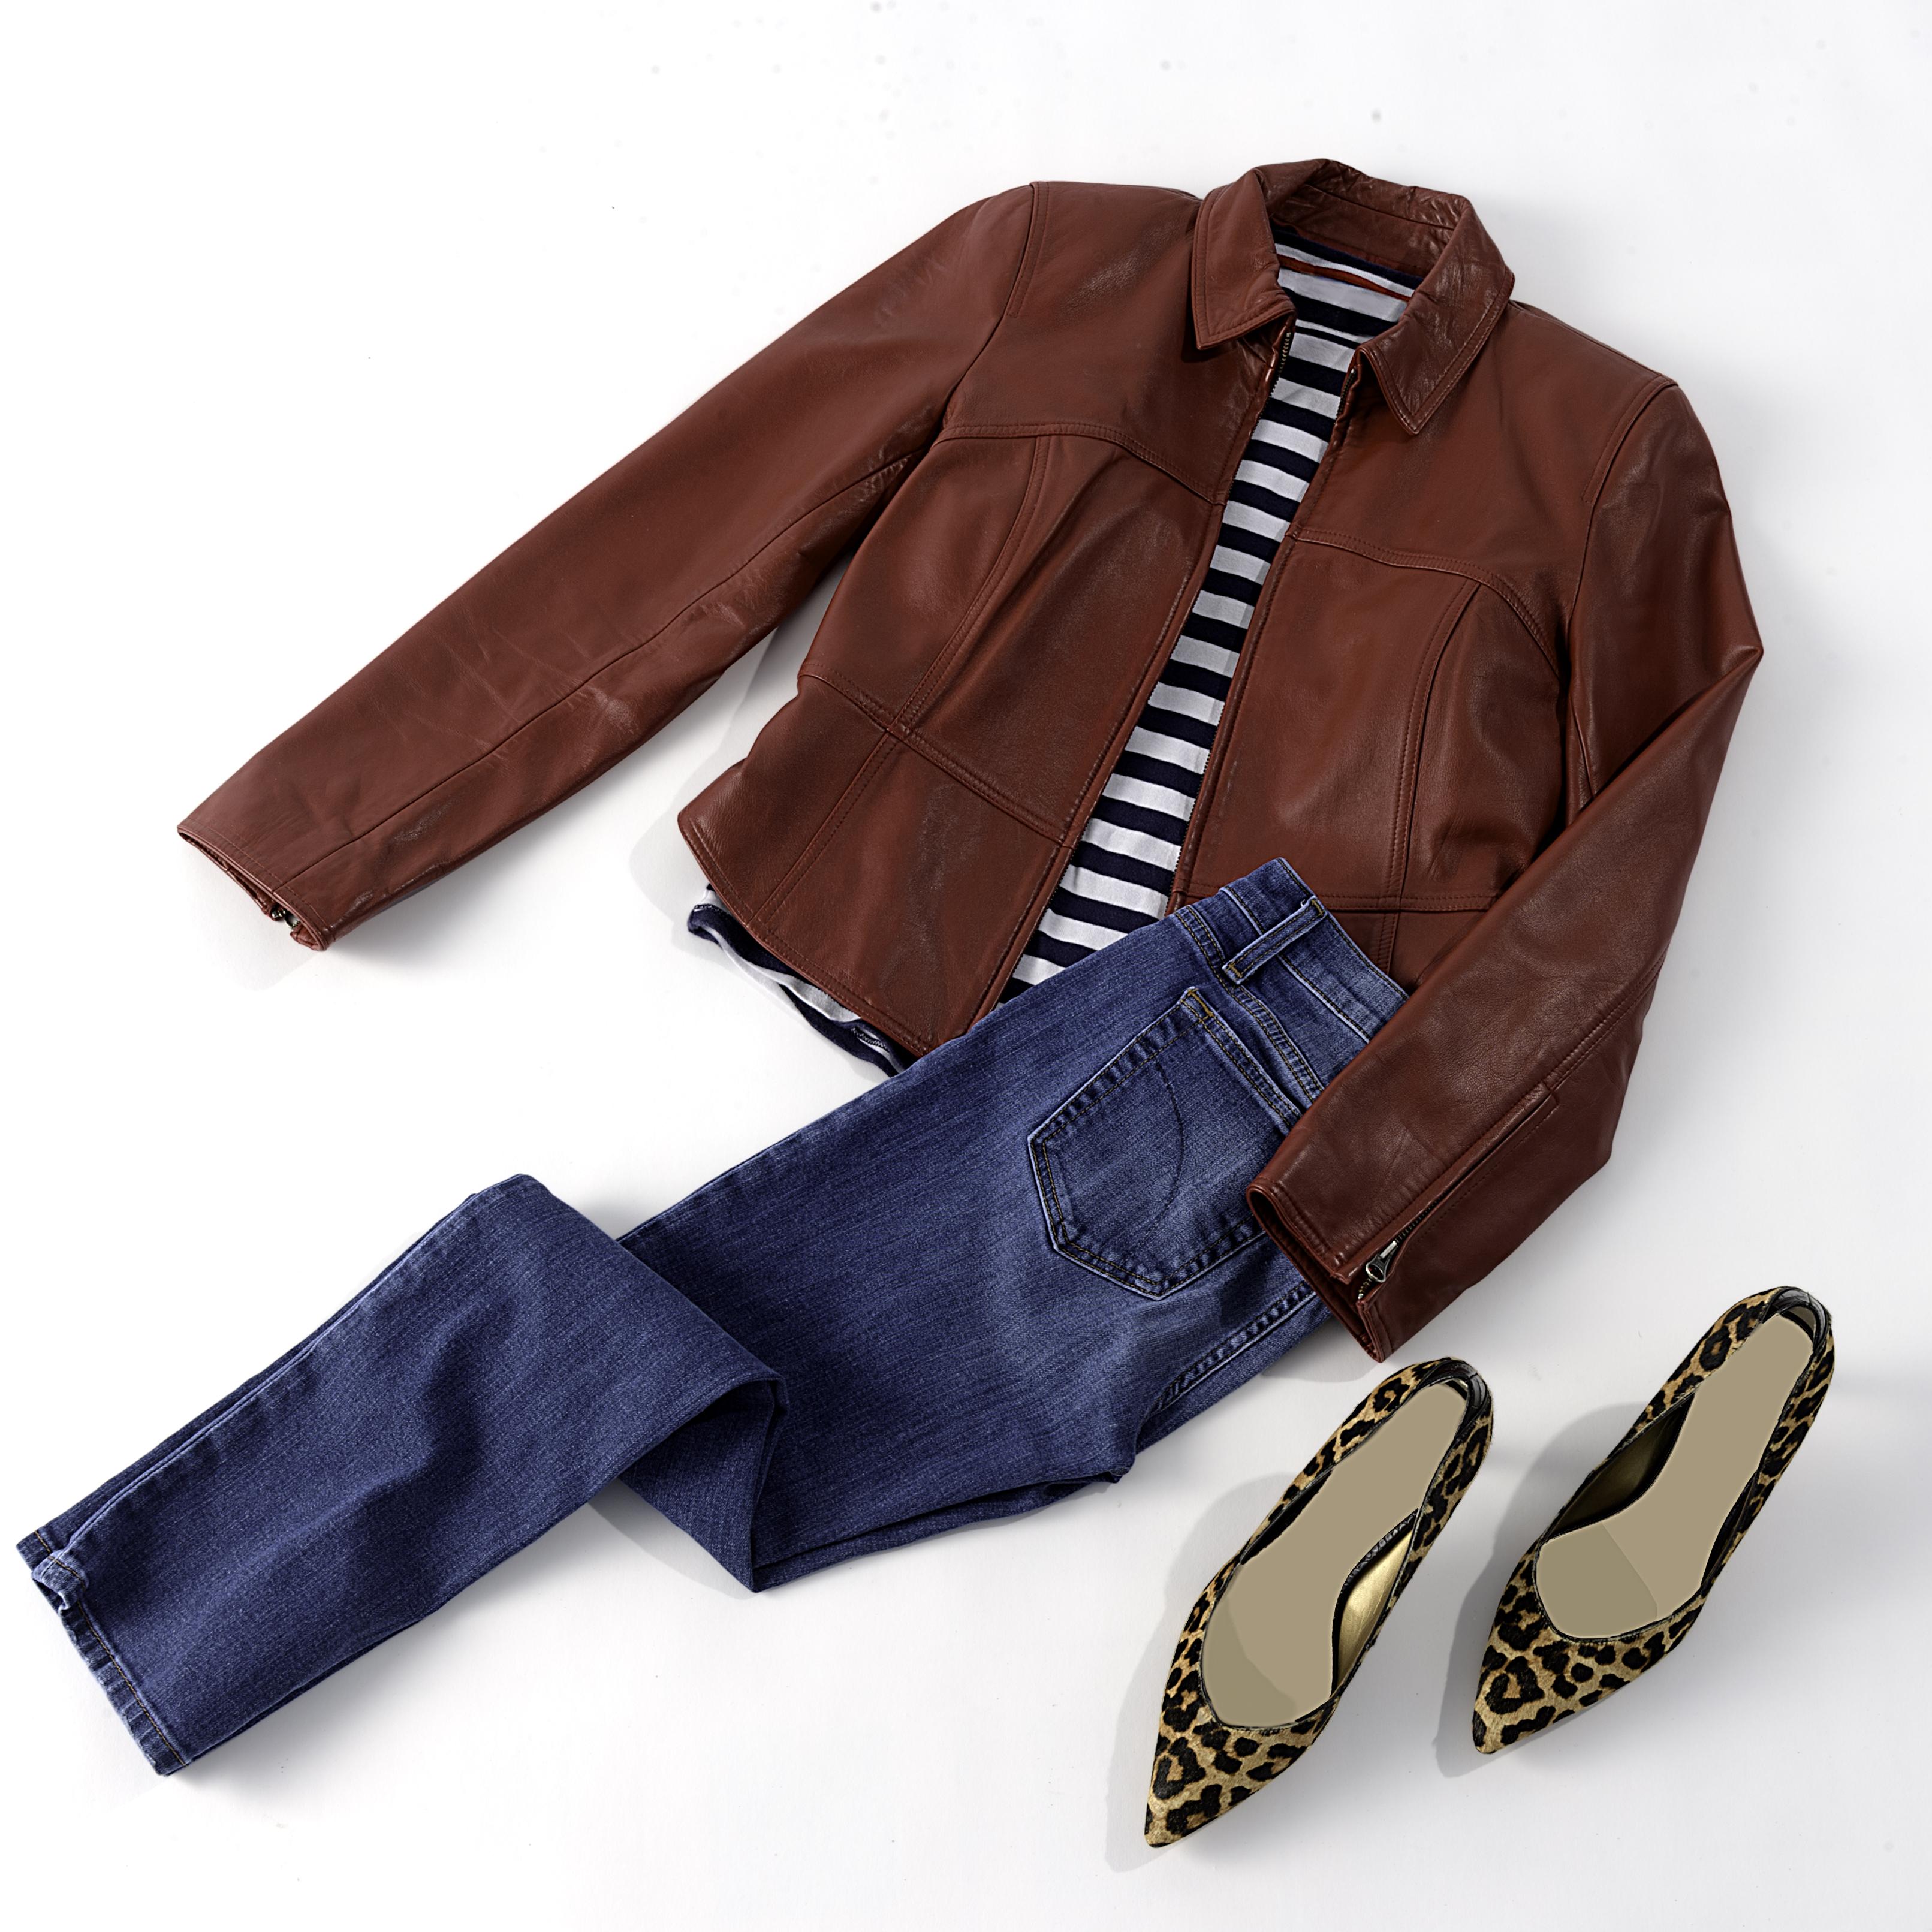 style & clothing step 2